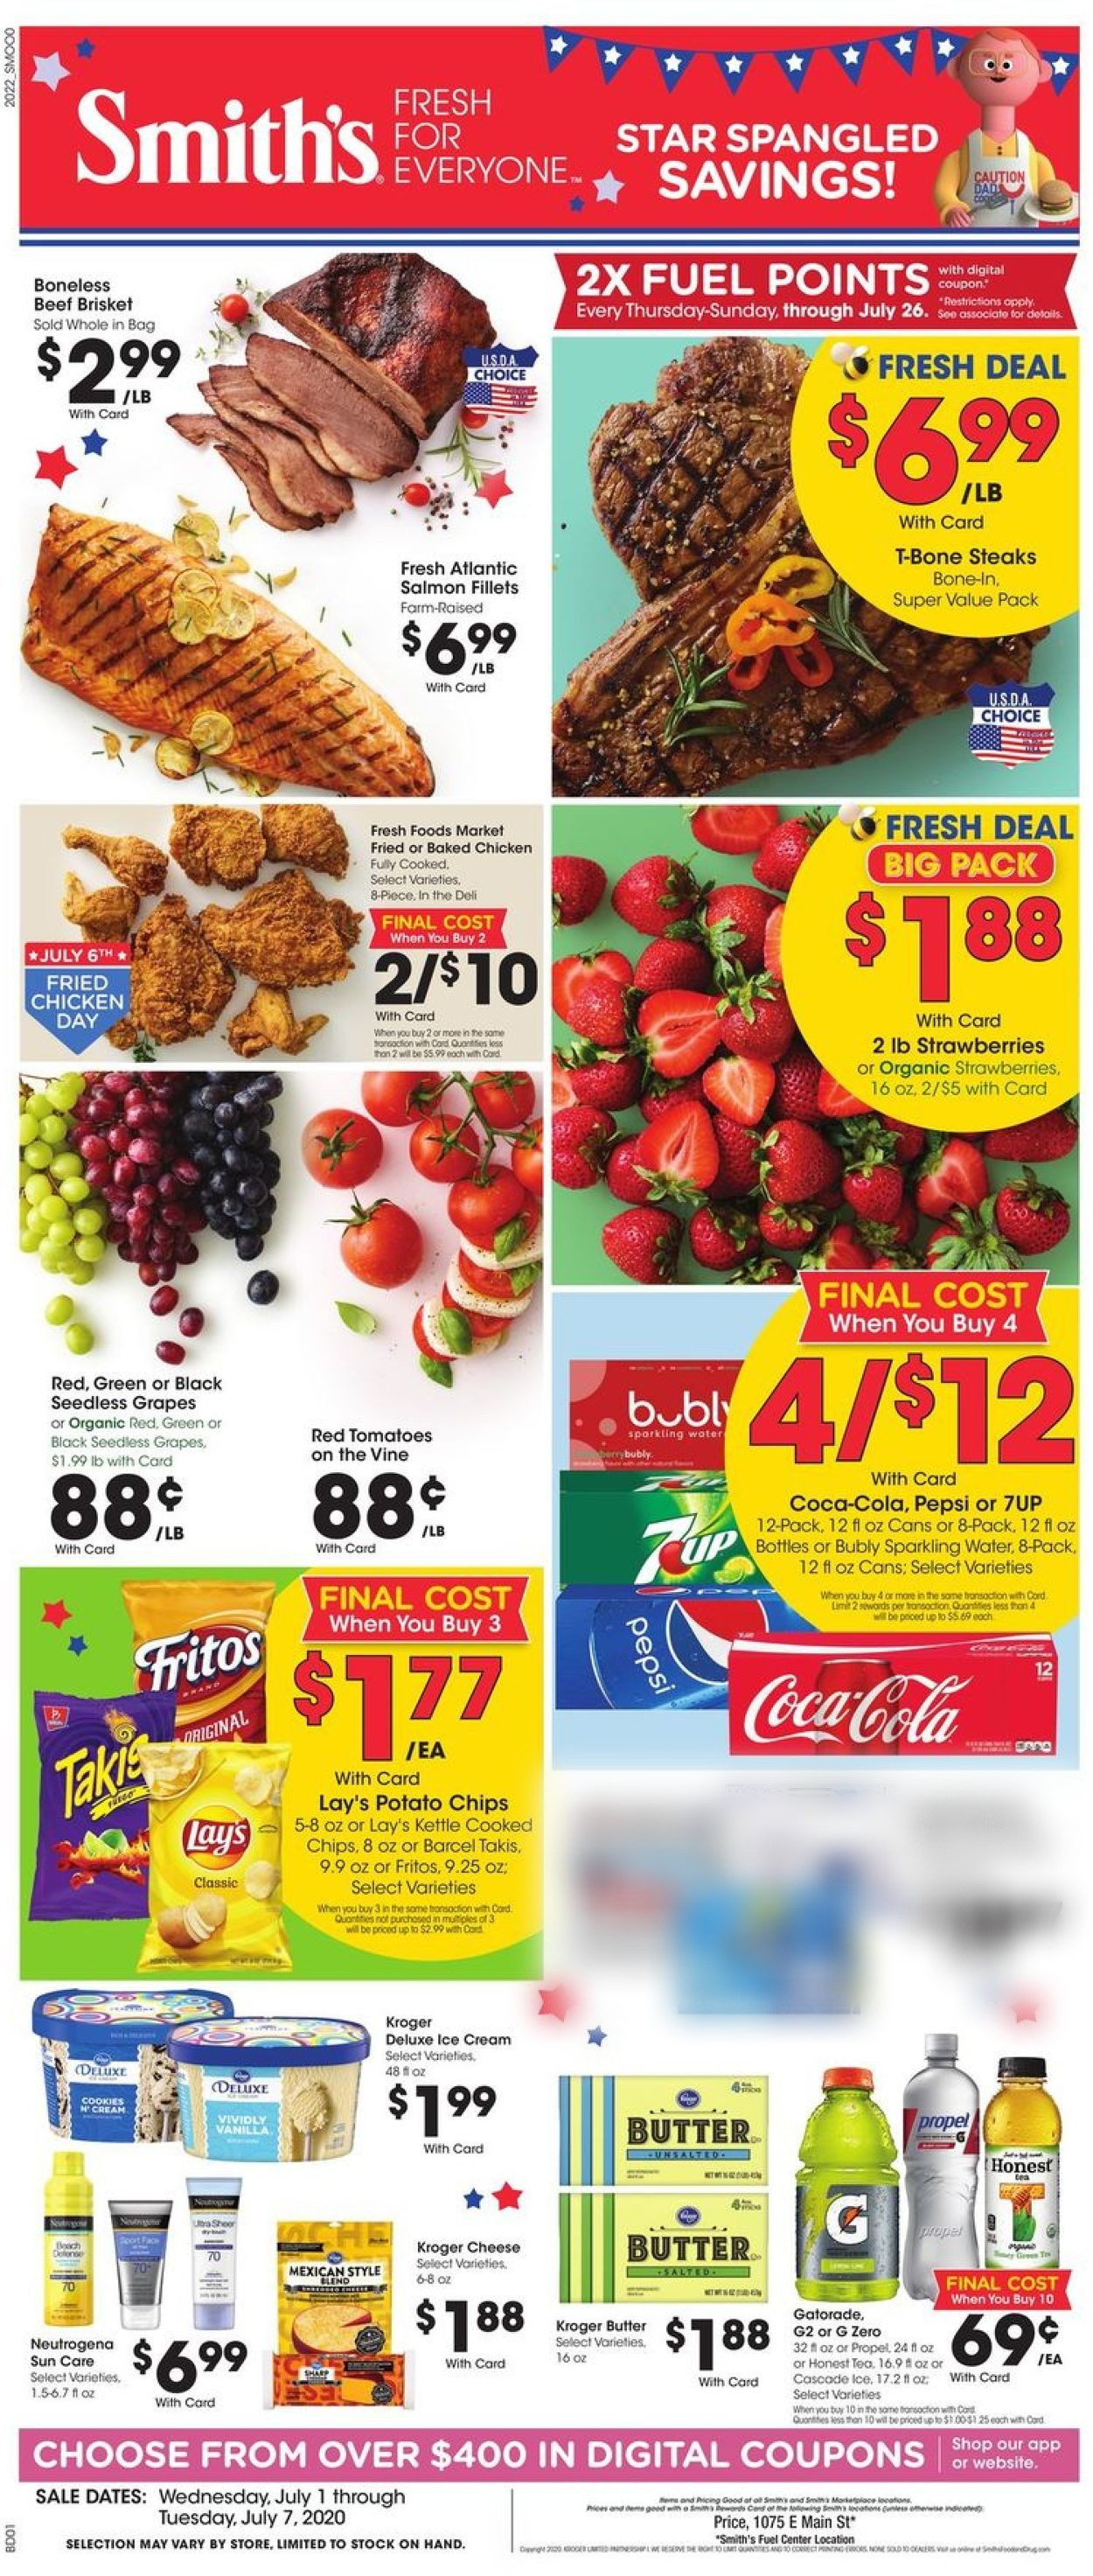 Smith's Weekly Ad Circular - valid 07/01-07/07/2020